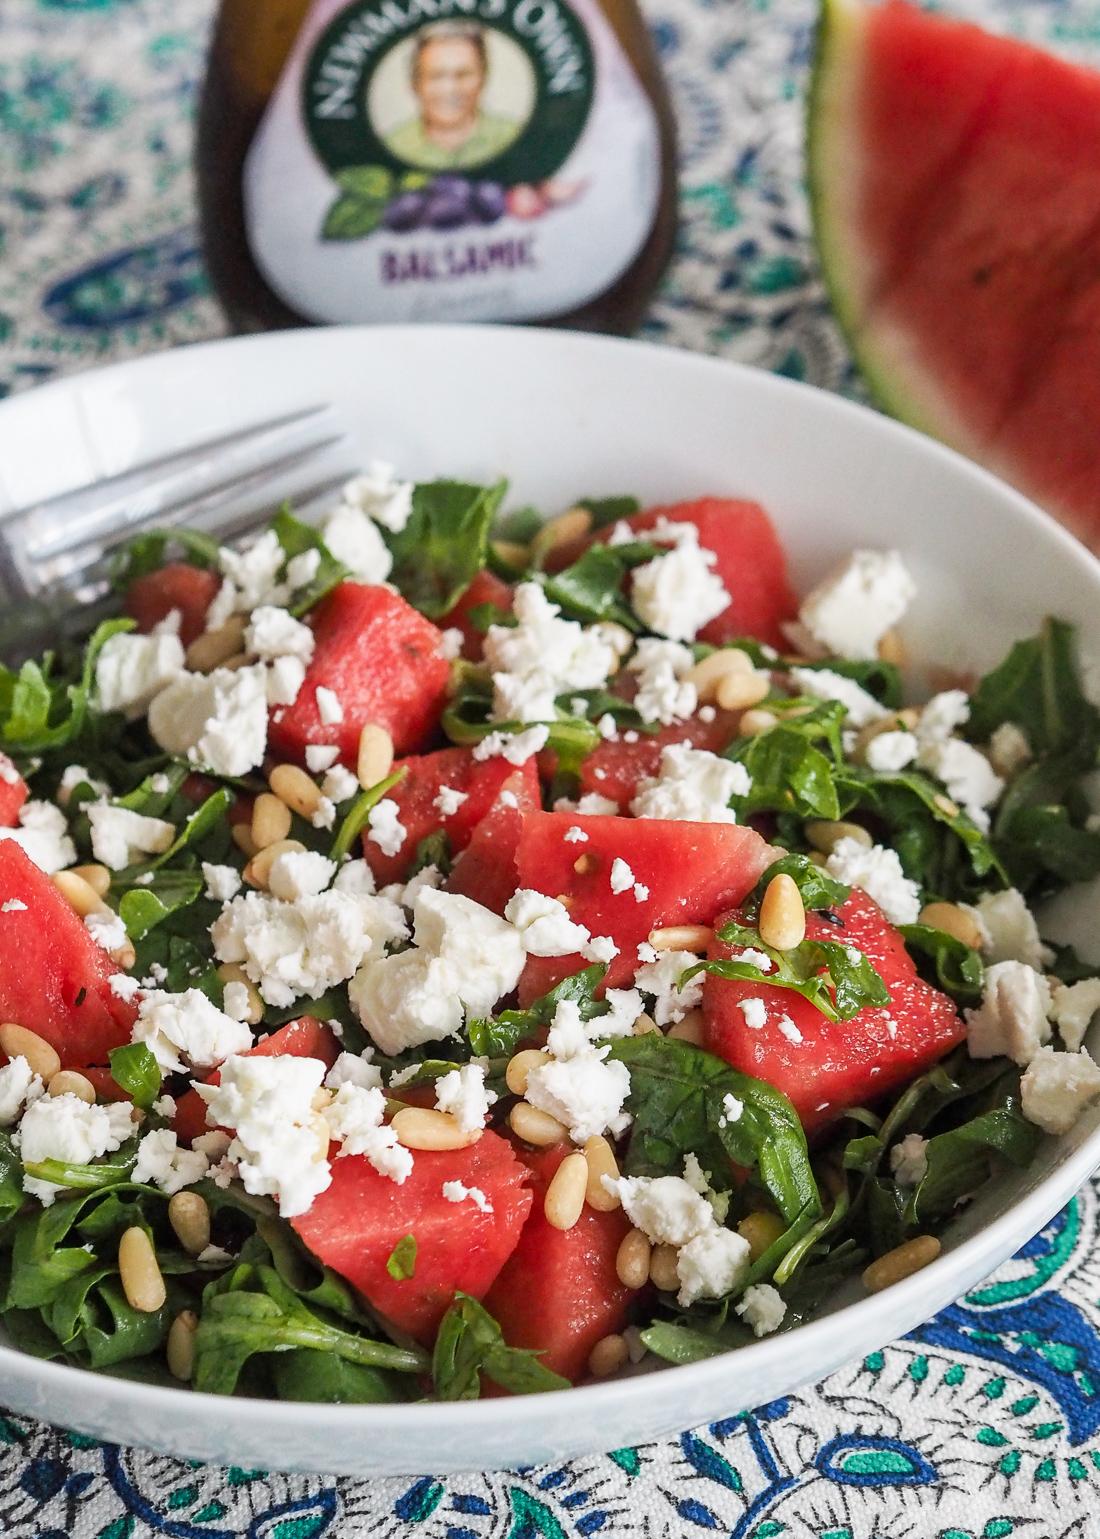 watermelon feta arugula salad with balsamic dressing